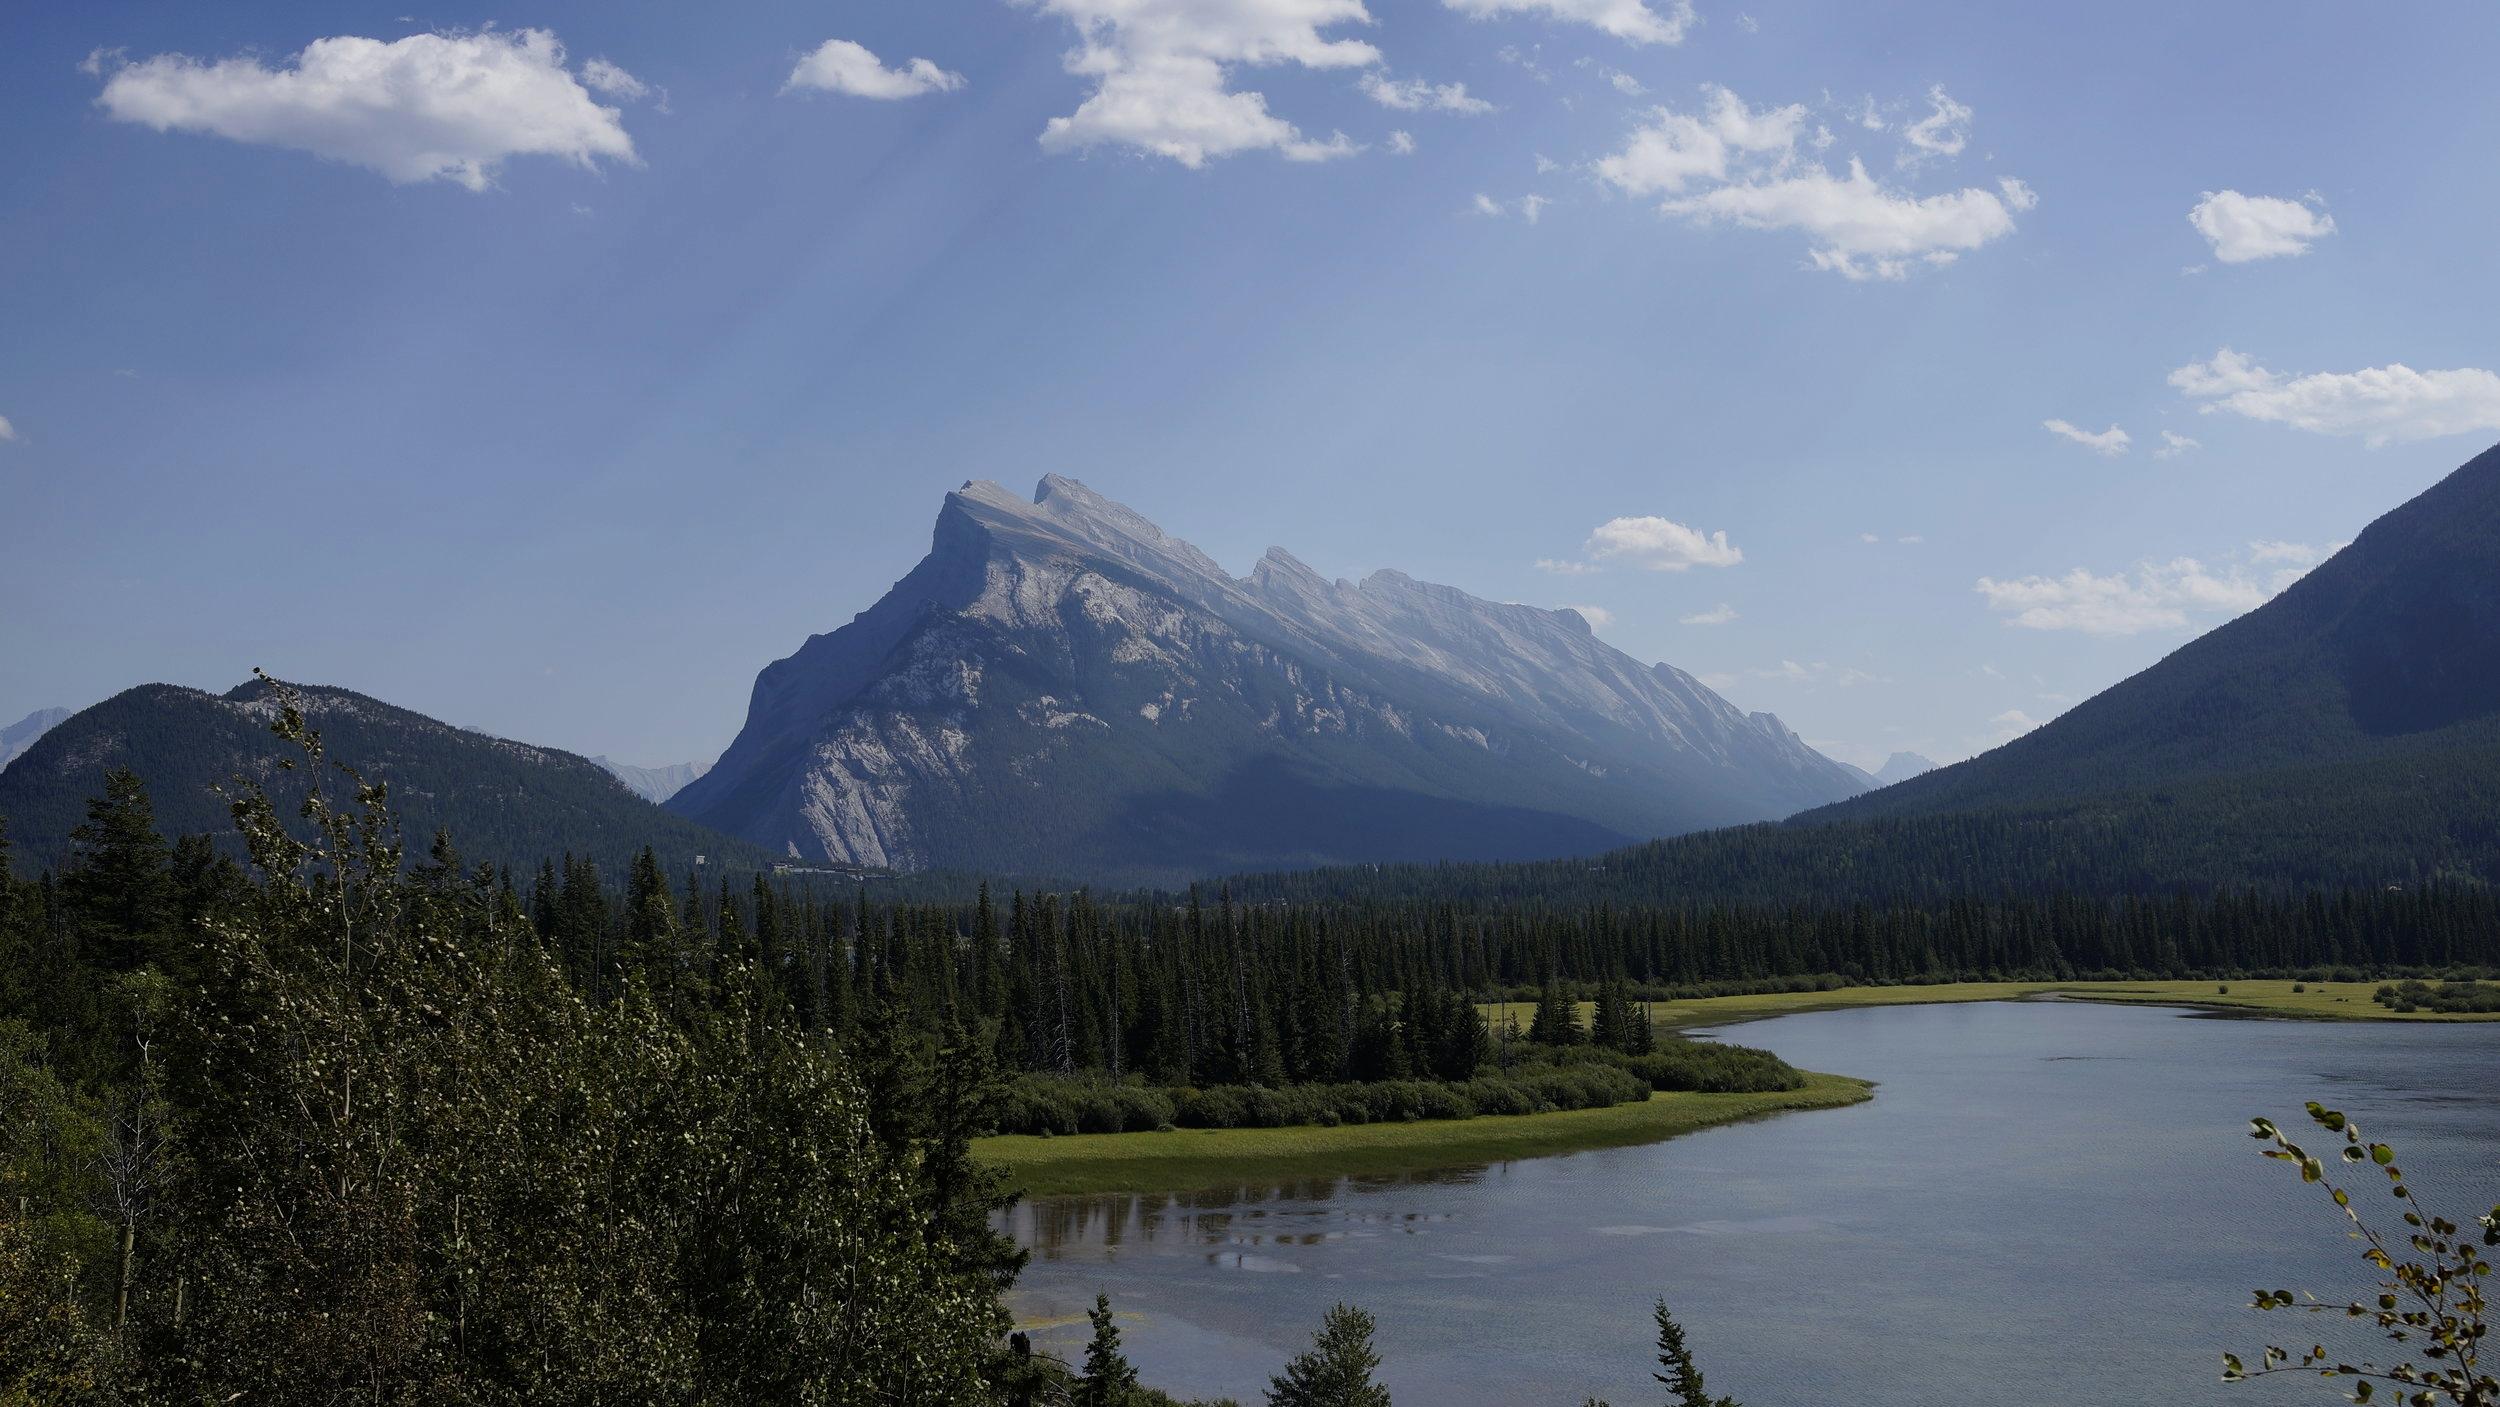 Mt. Rundle, Alberta. Canada.